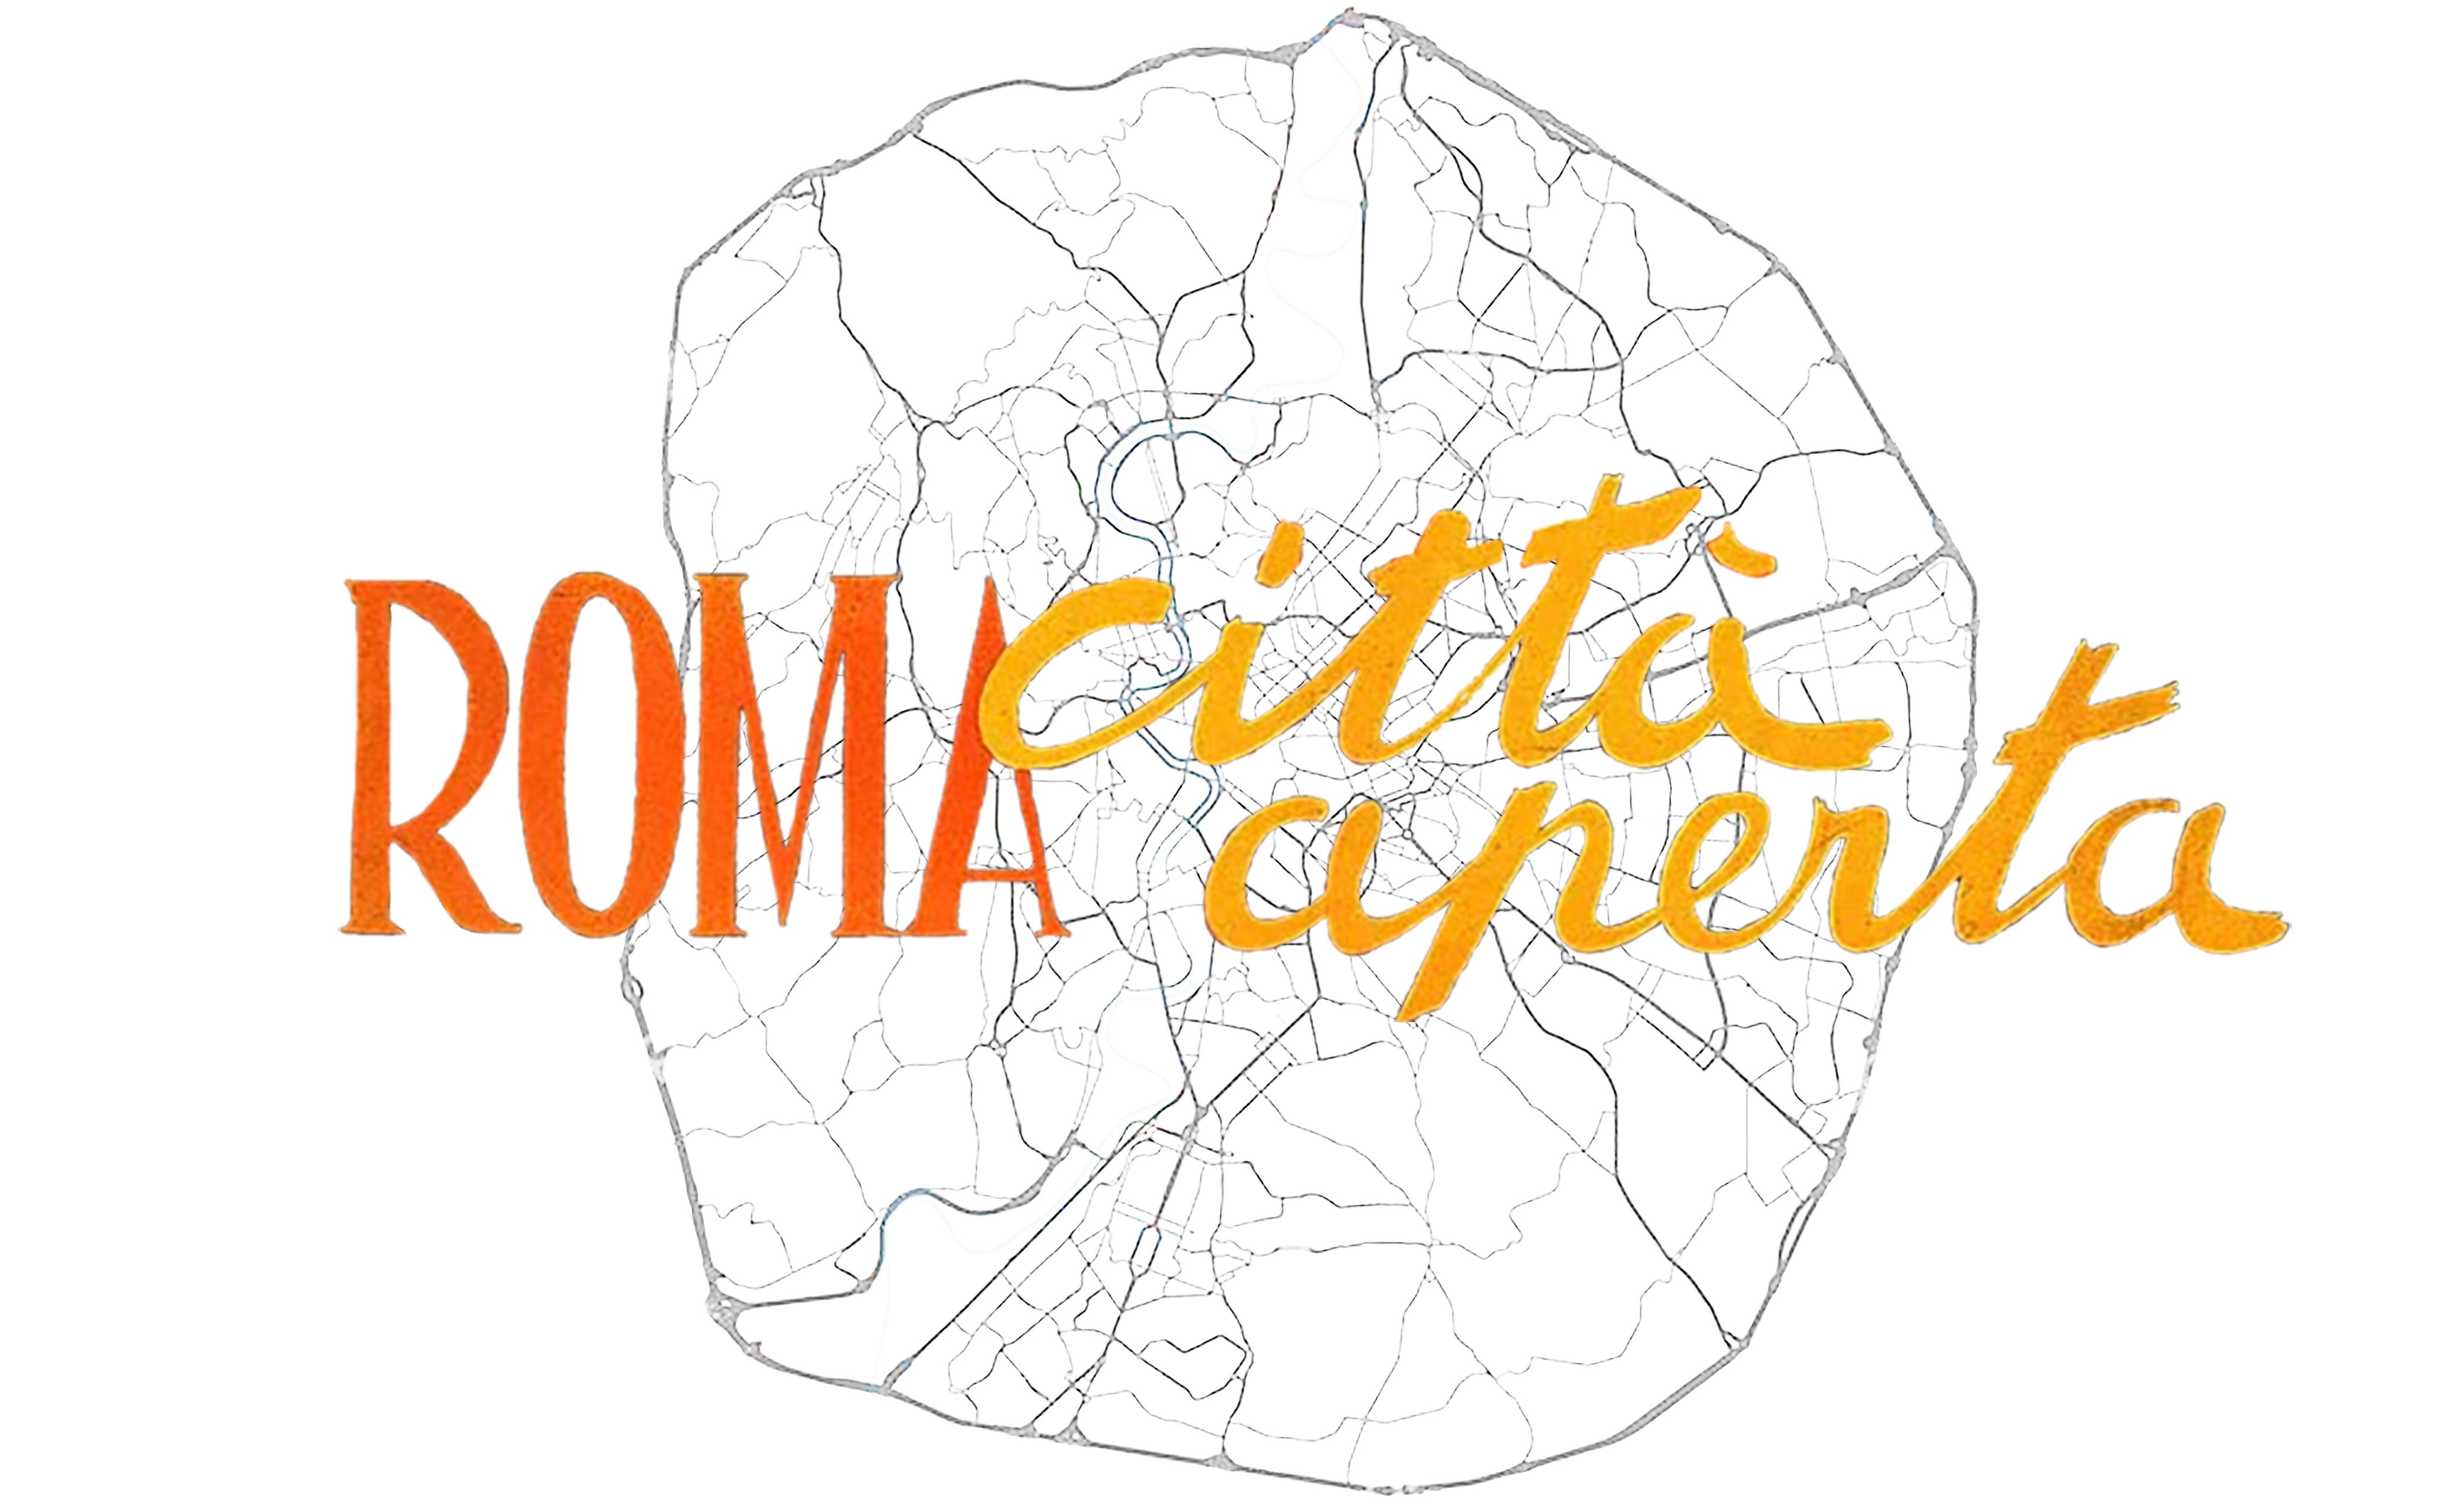 http://www.icom-italia.org/wp-content/uploads/wpforms/10320-346379fc8433371d8ed056fee97d2a28/roma-citta%CC%80-aperta_logo-fe2ffcb264e45bf6fb6877dce6b9a49b.jpg